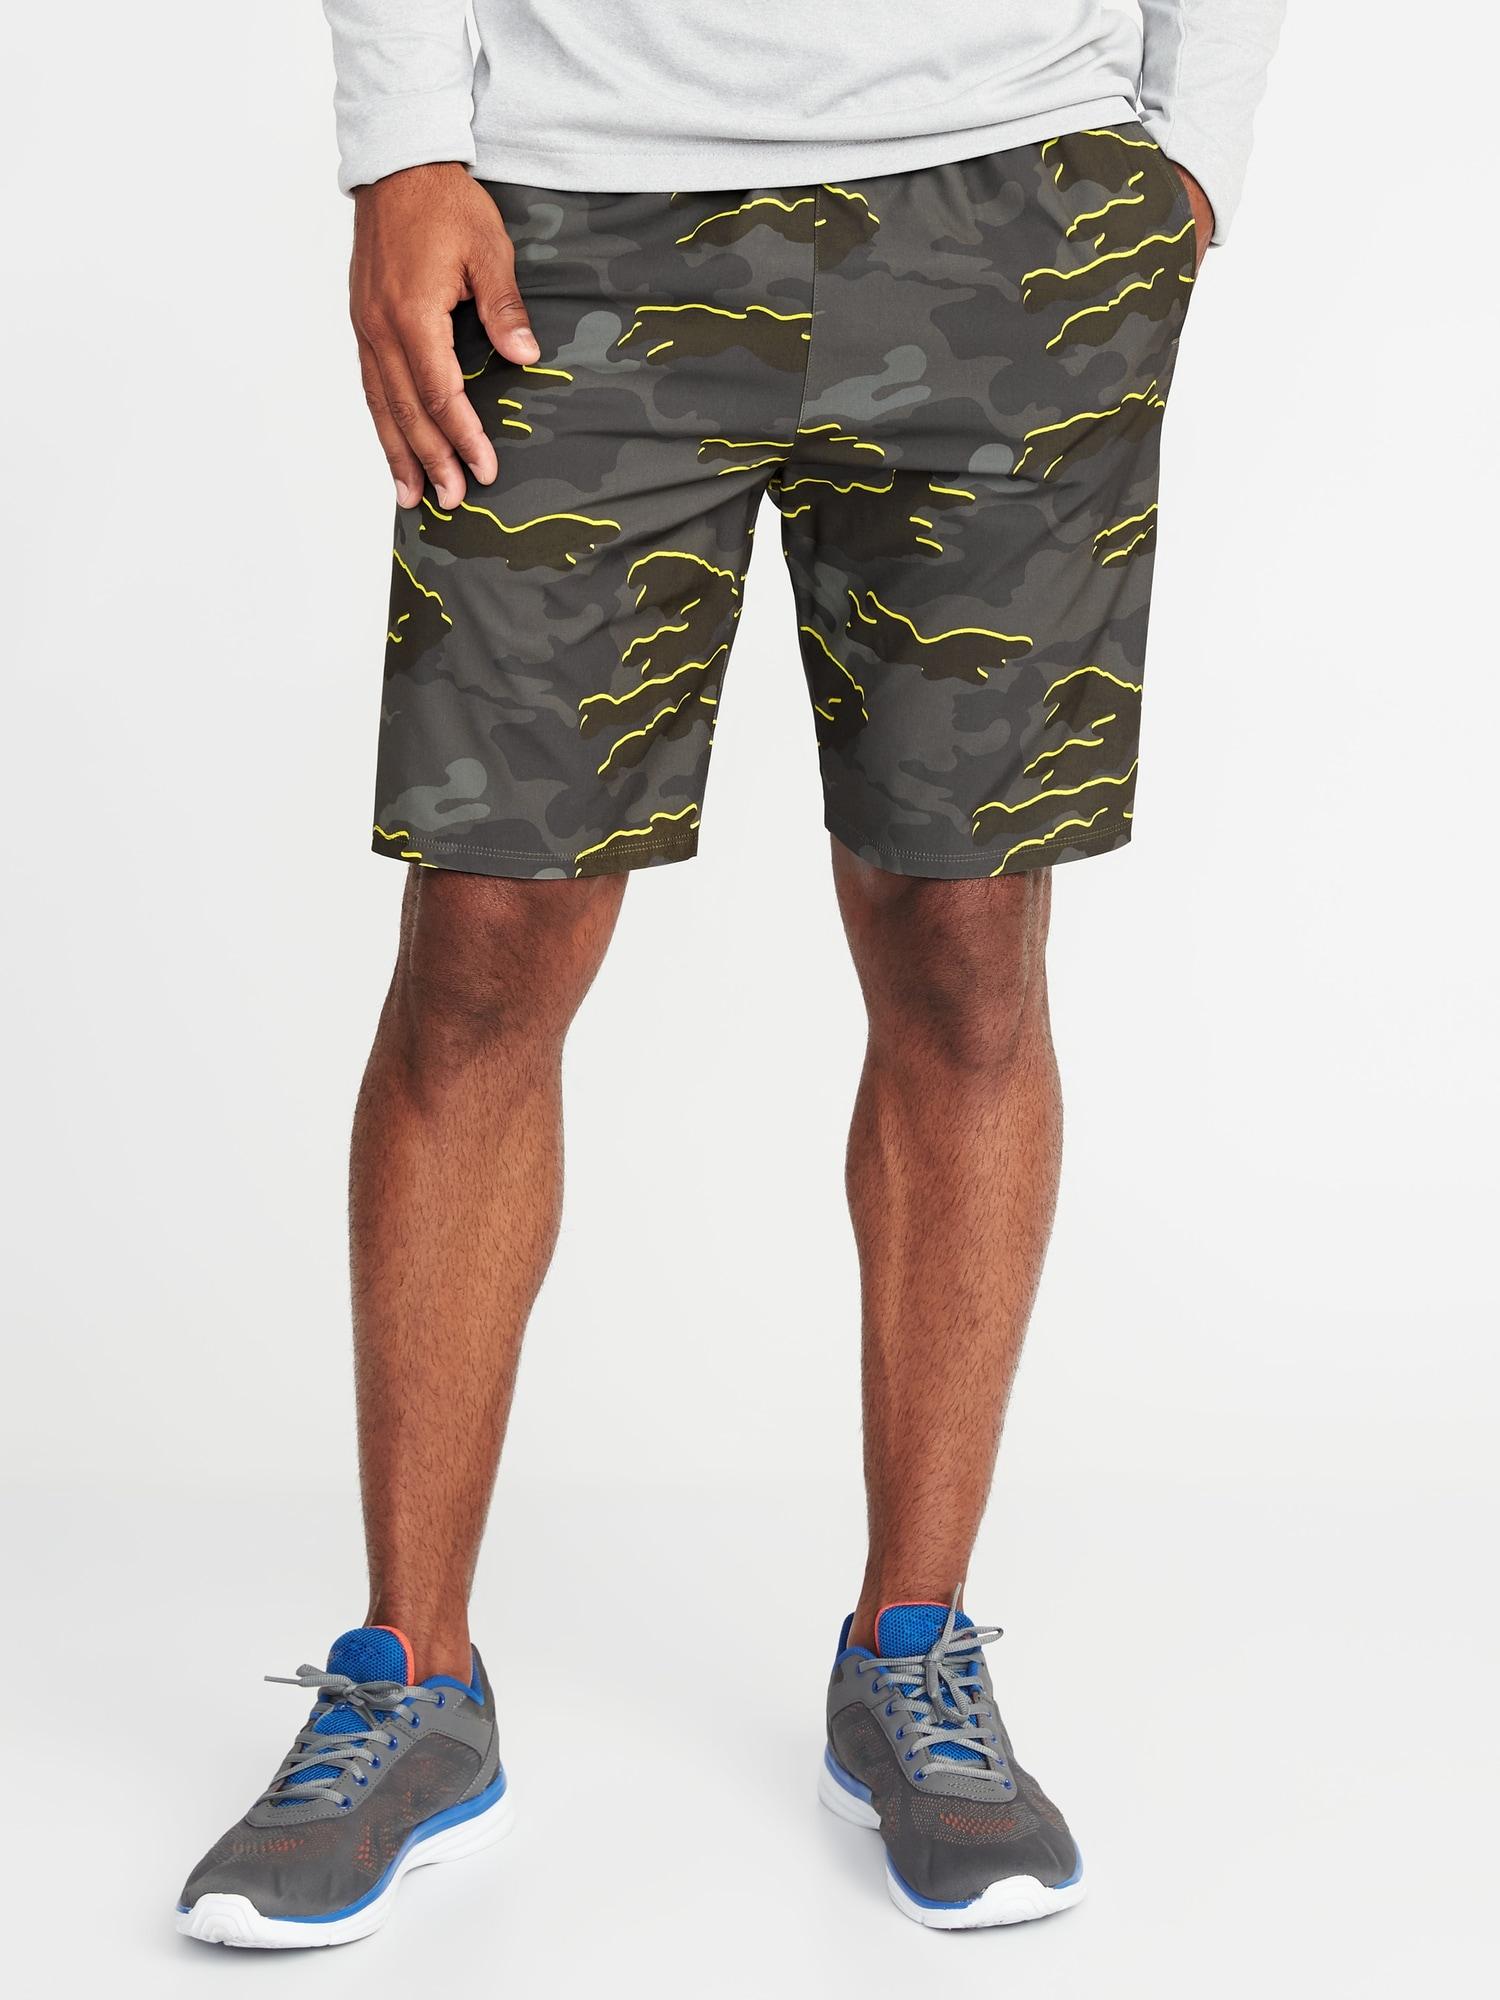 ba5c3e82c0 Go-Dry 4-Way Stretch Run Shorts for Men - 9-inch inseam